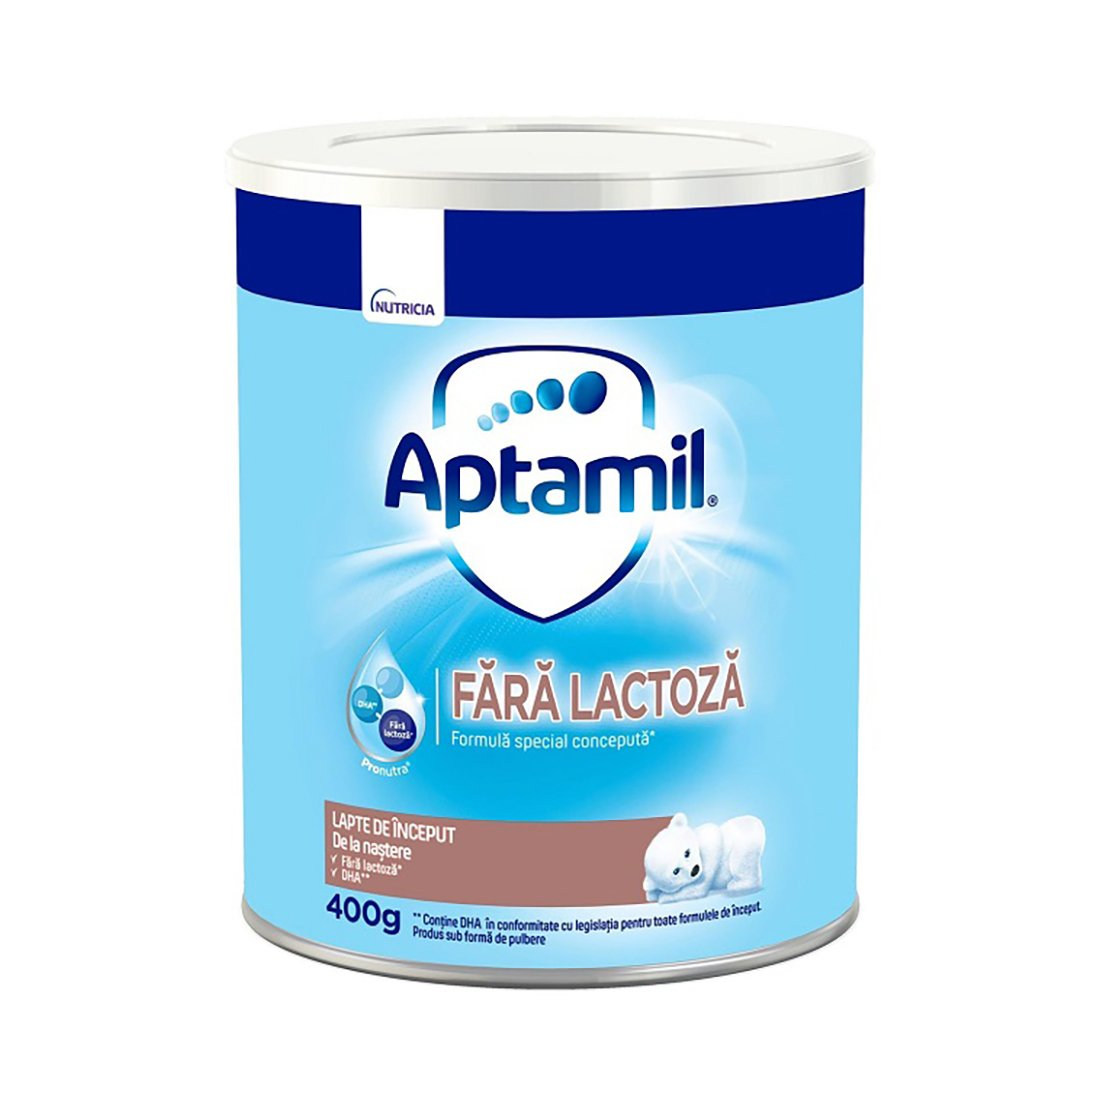 Lapte praf de inceput Aptamil fara lactoza, 400 g imagine